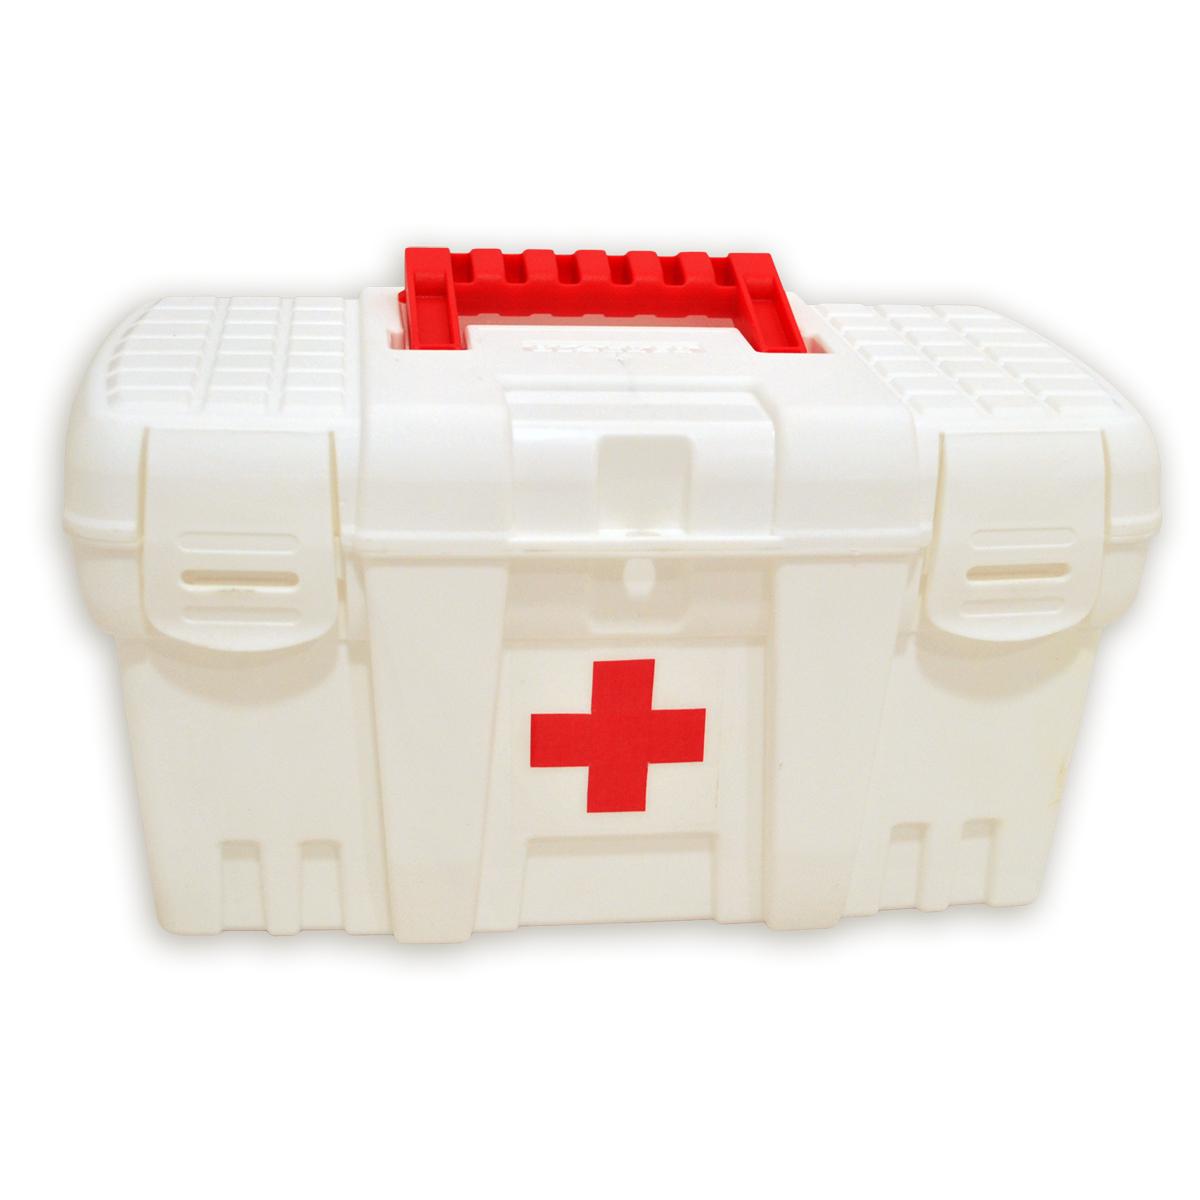 Аптечка Blocker Скорая Помощь, цвет: белый, 265 х 155 х 140 мм blocker 265 155 140